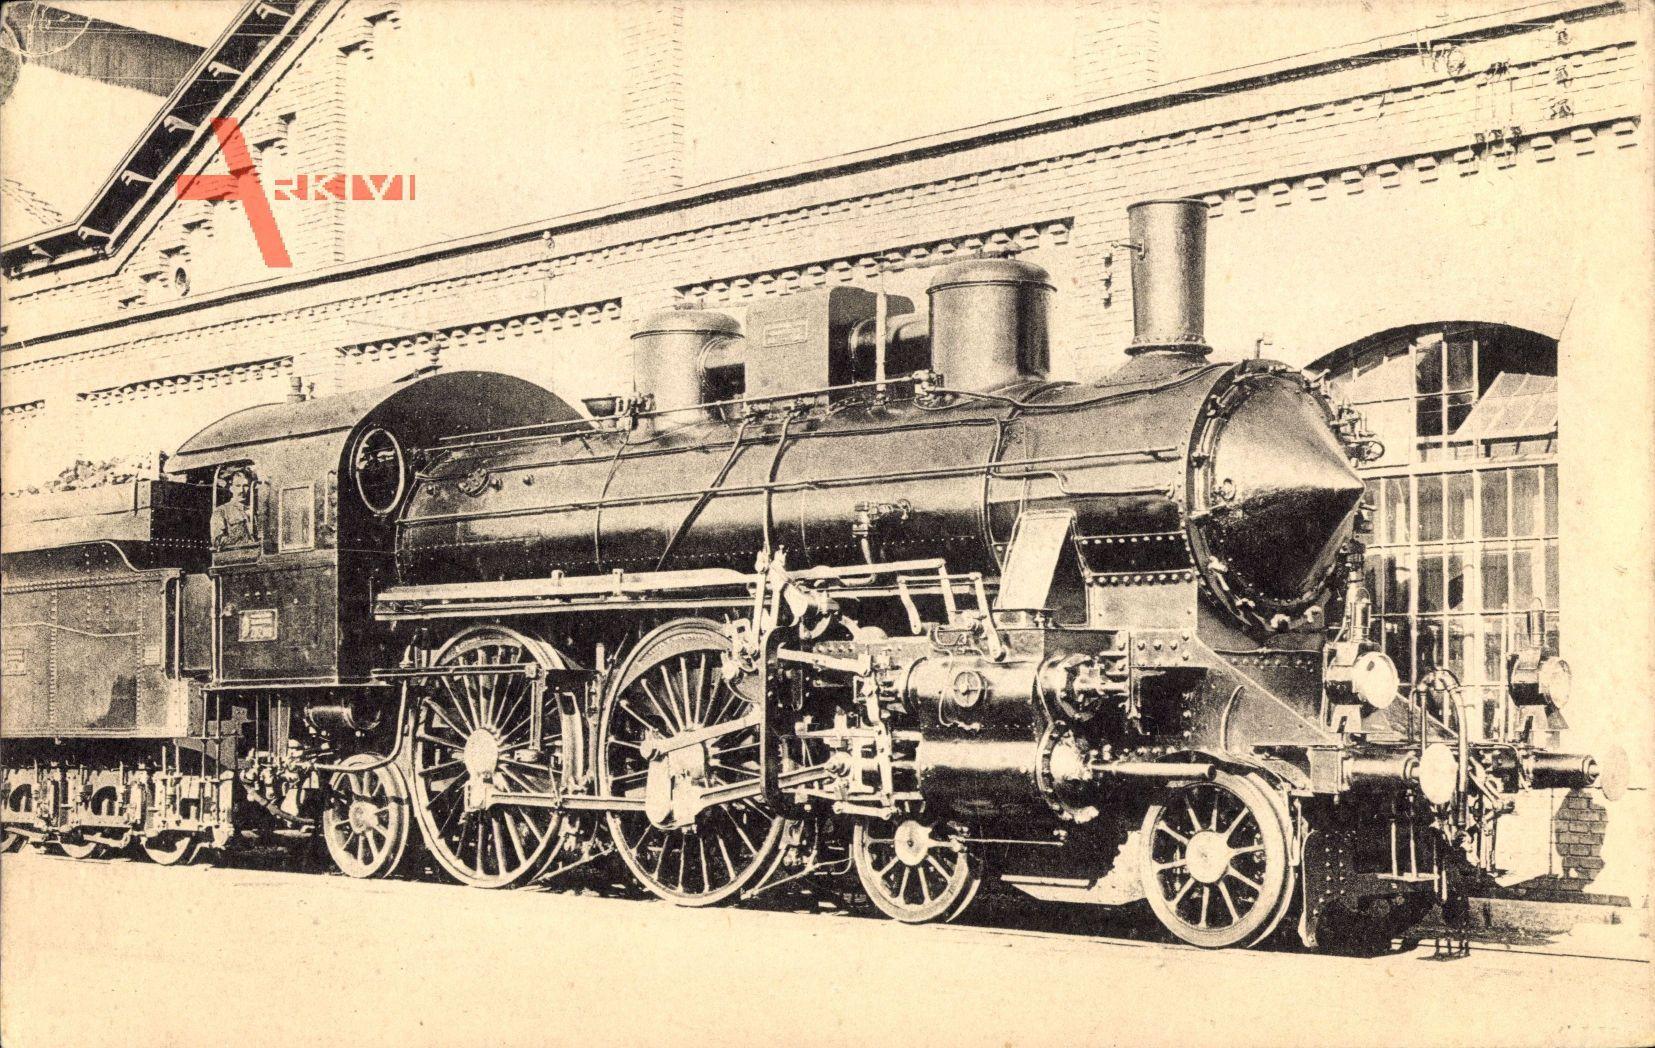 Ungarische Eisenbahn, Dampflokomotive, Chemin de fer Hongroise, MAV, Type 202